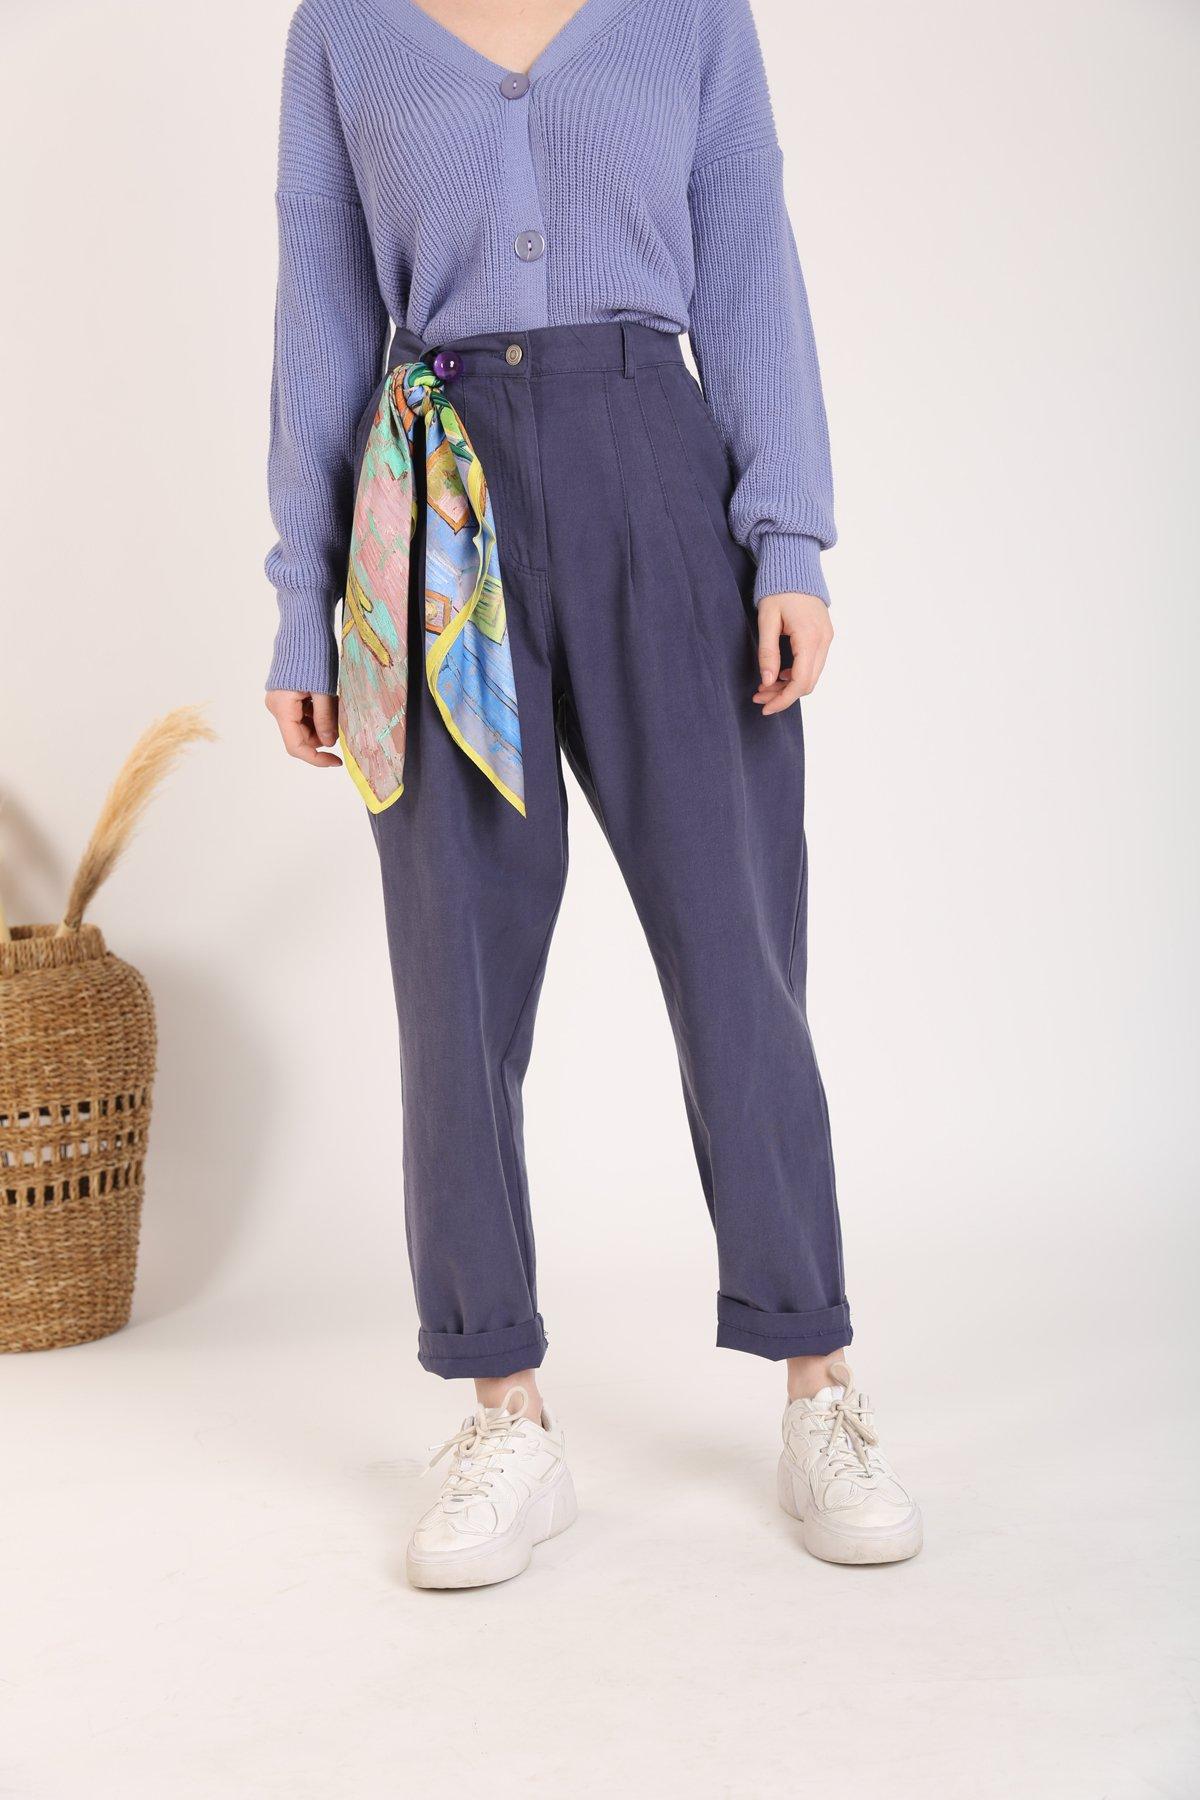 Pili Detay Pantolon